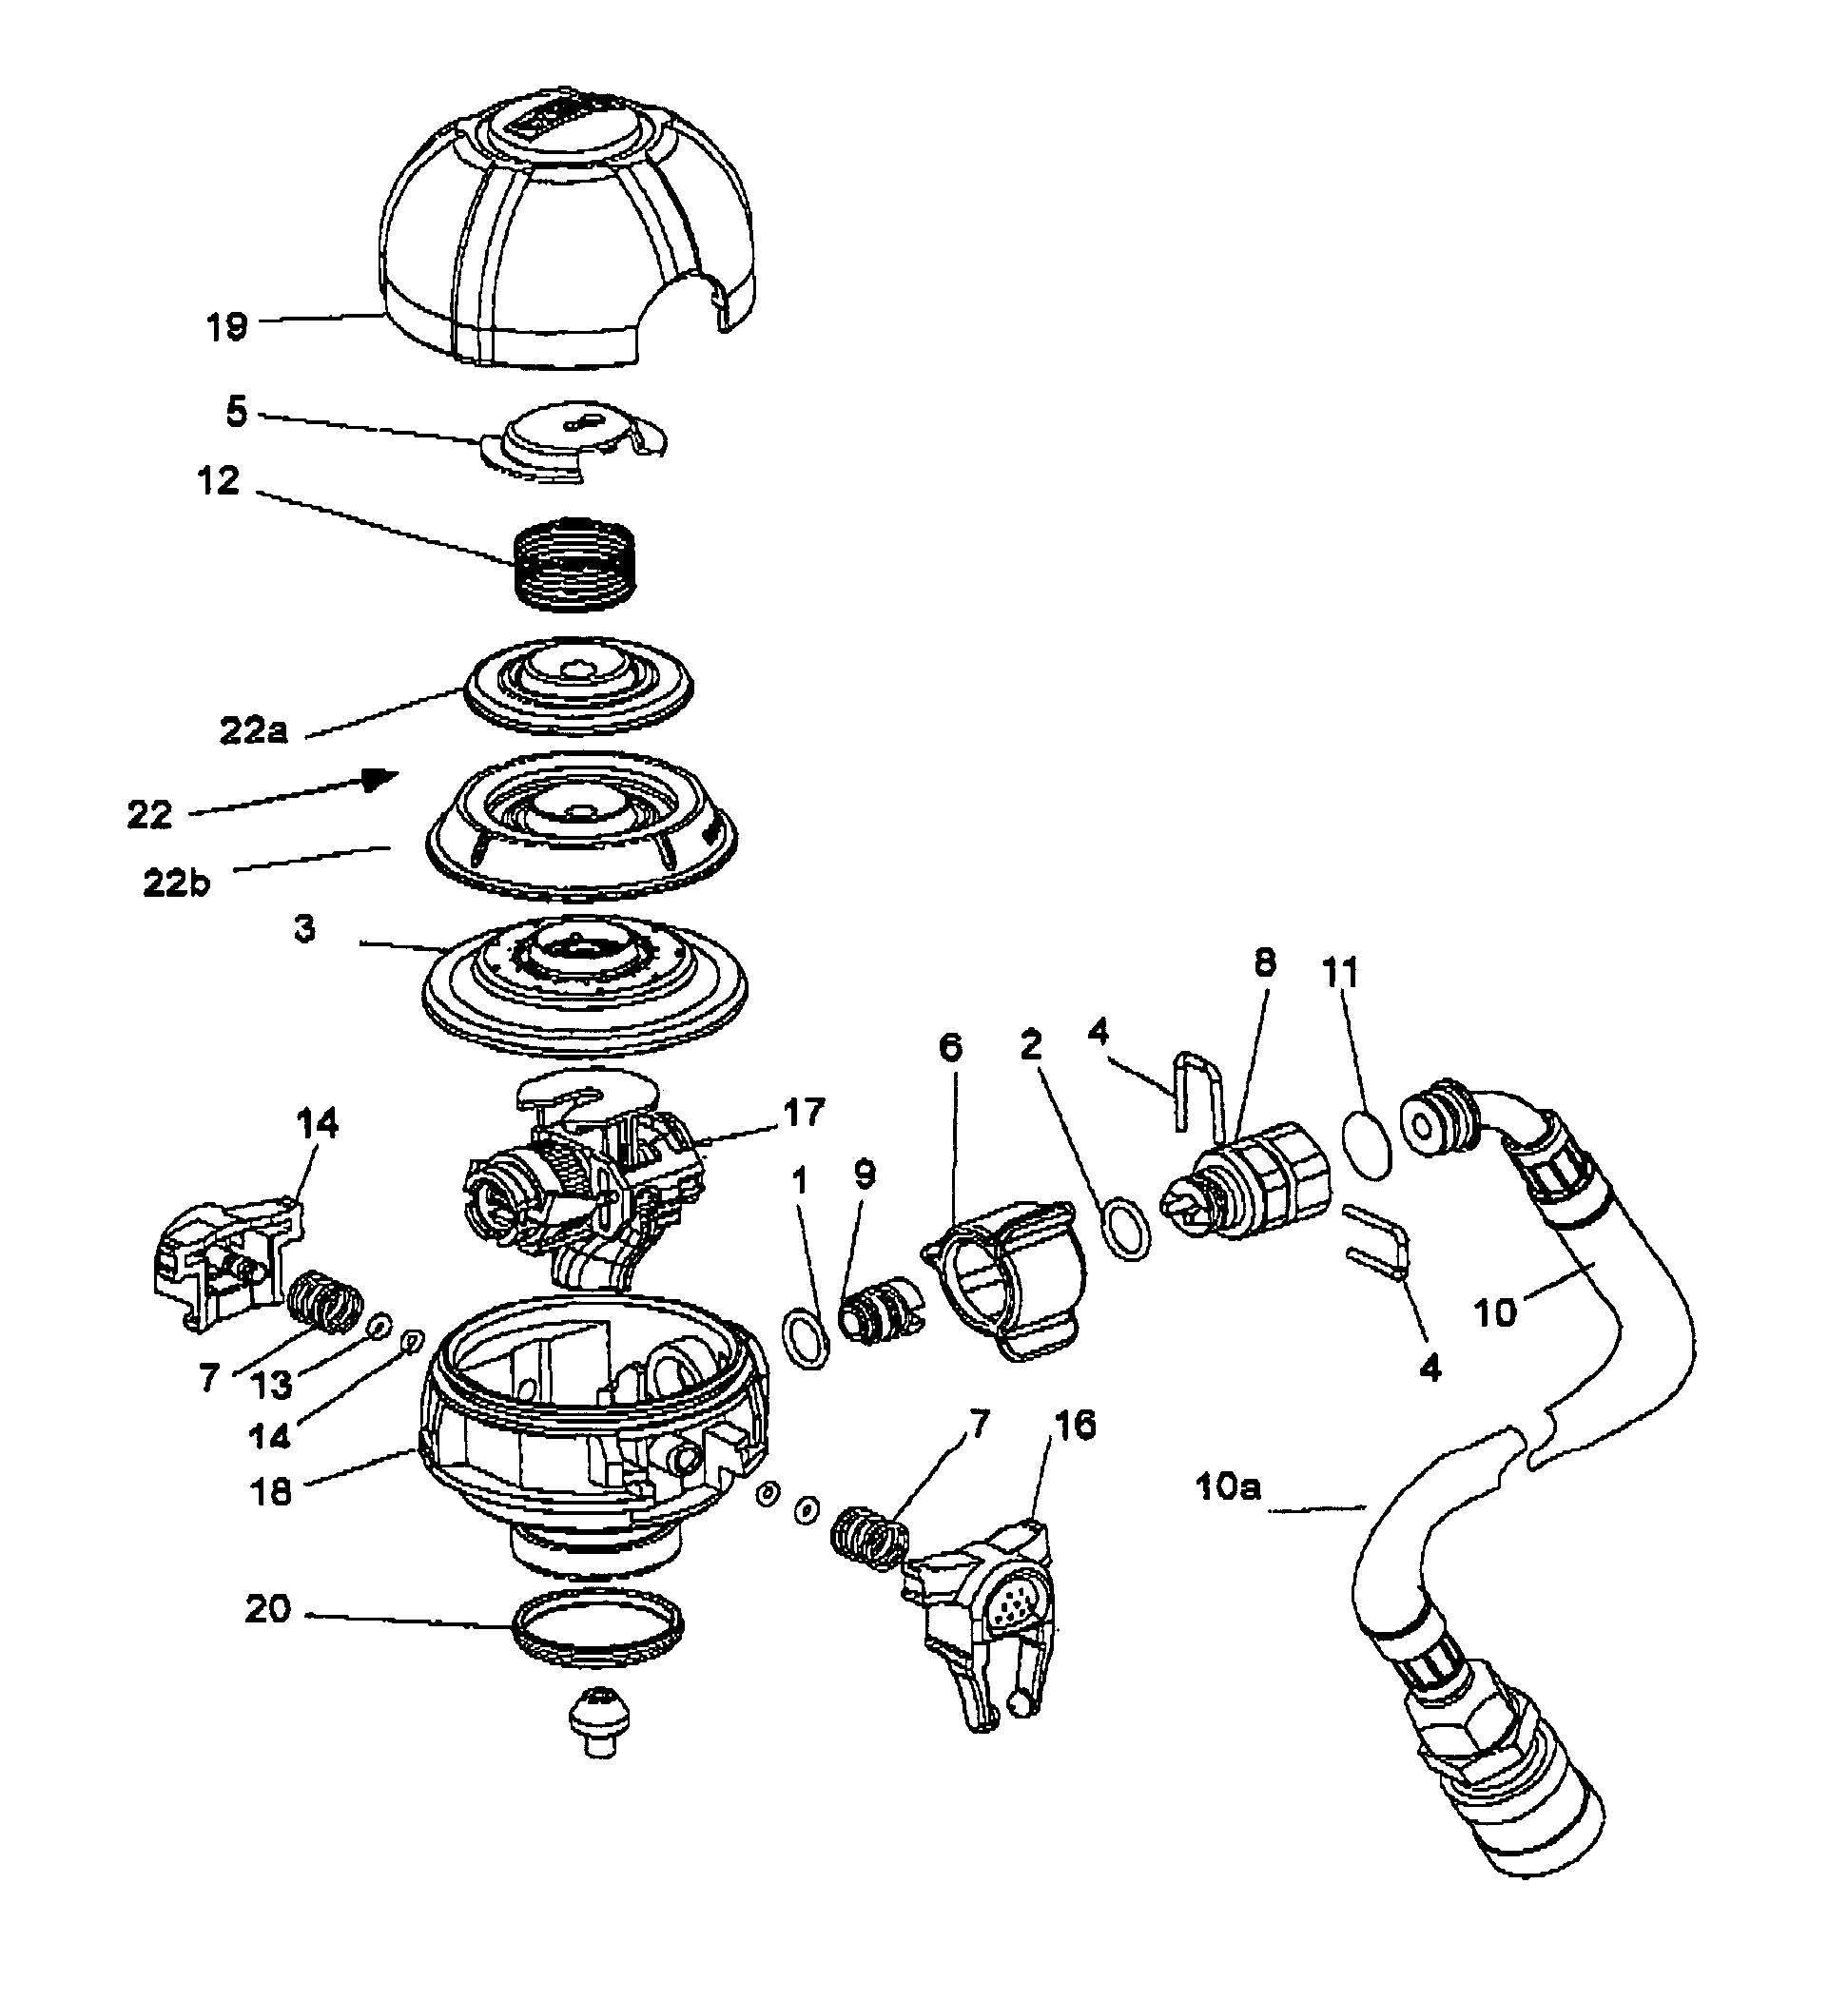 Patent US8025053 - Pressure regulator assembly - Google Patents